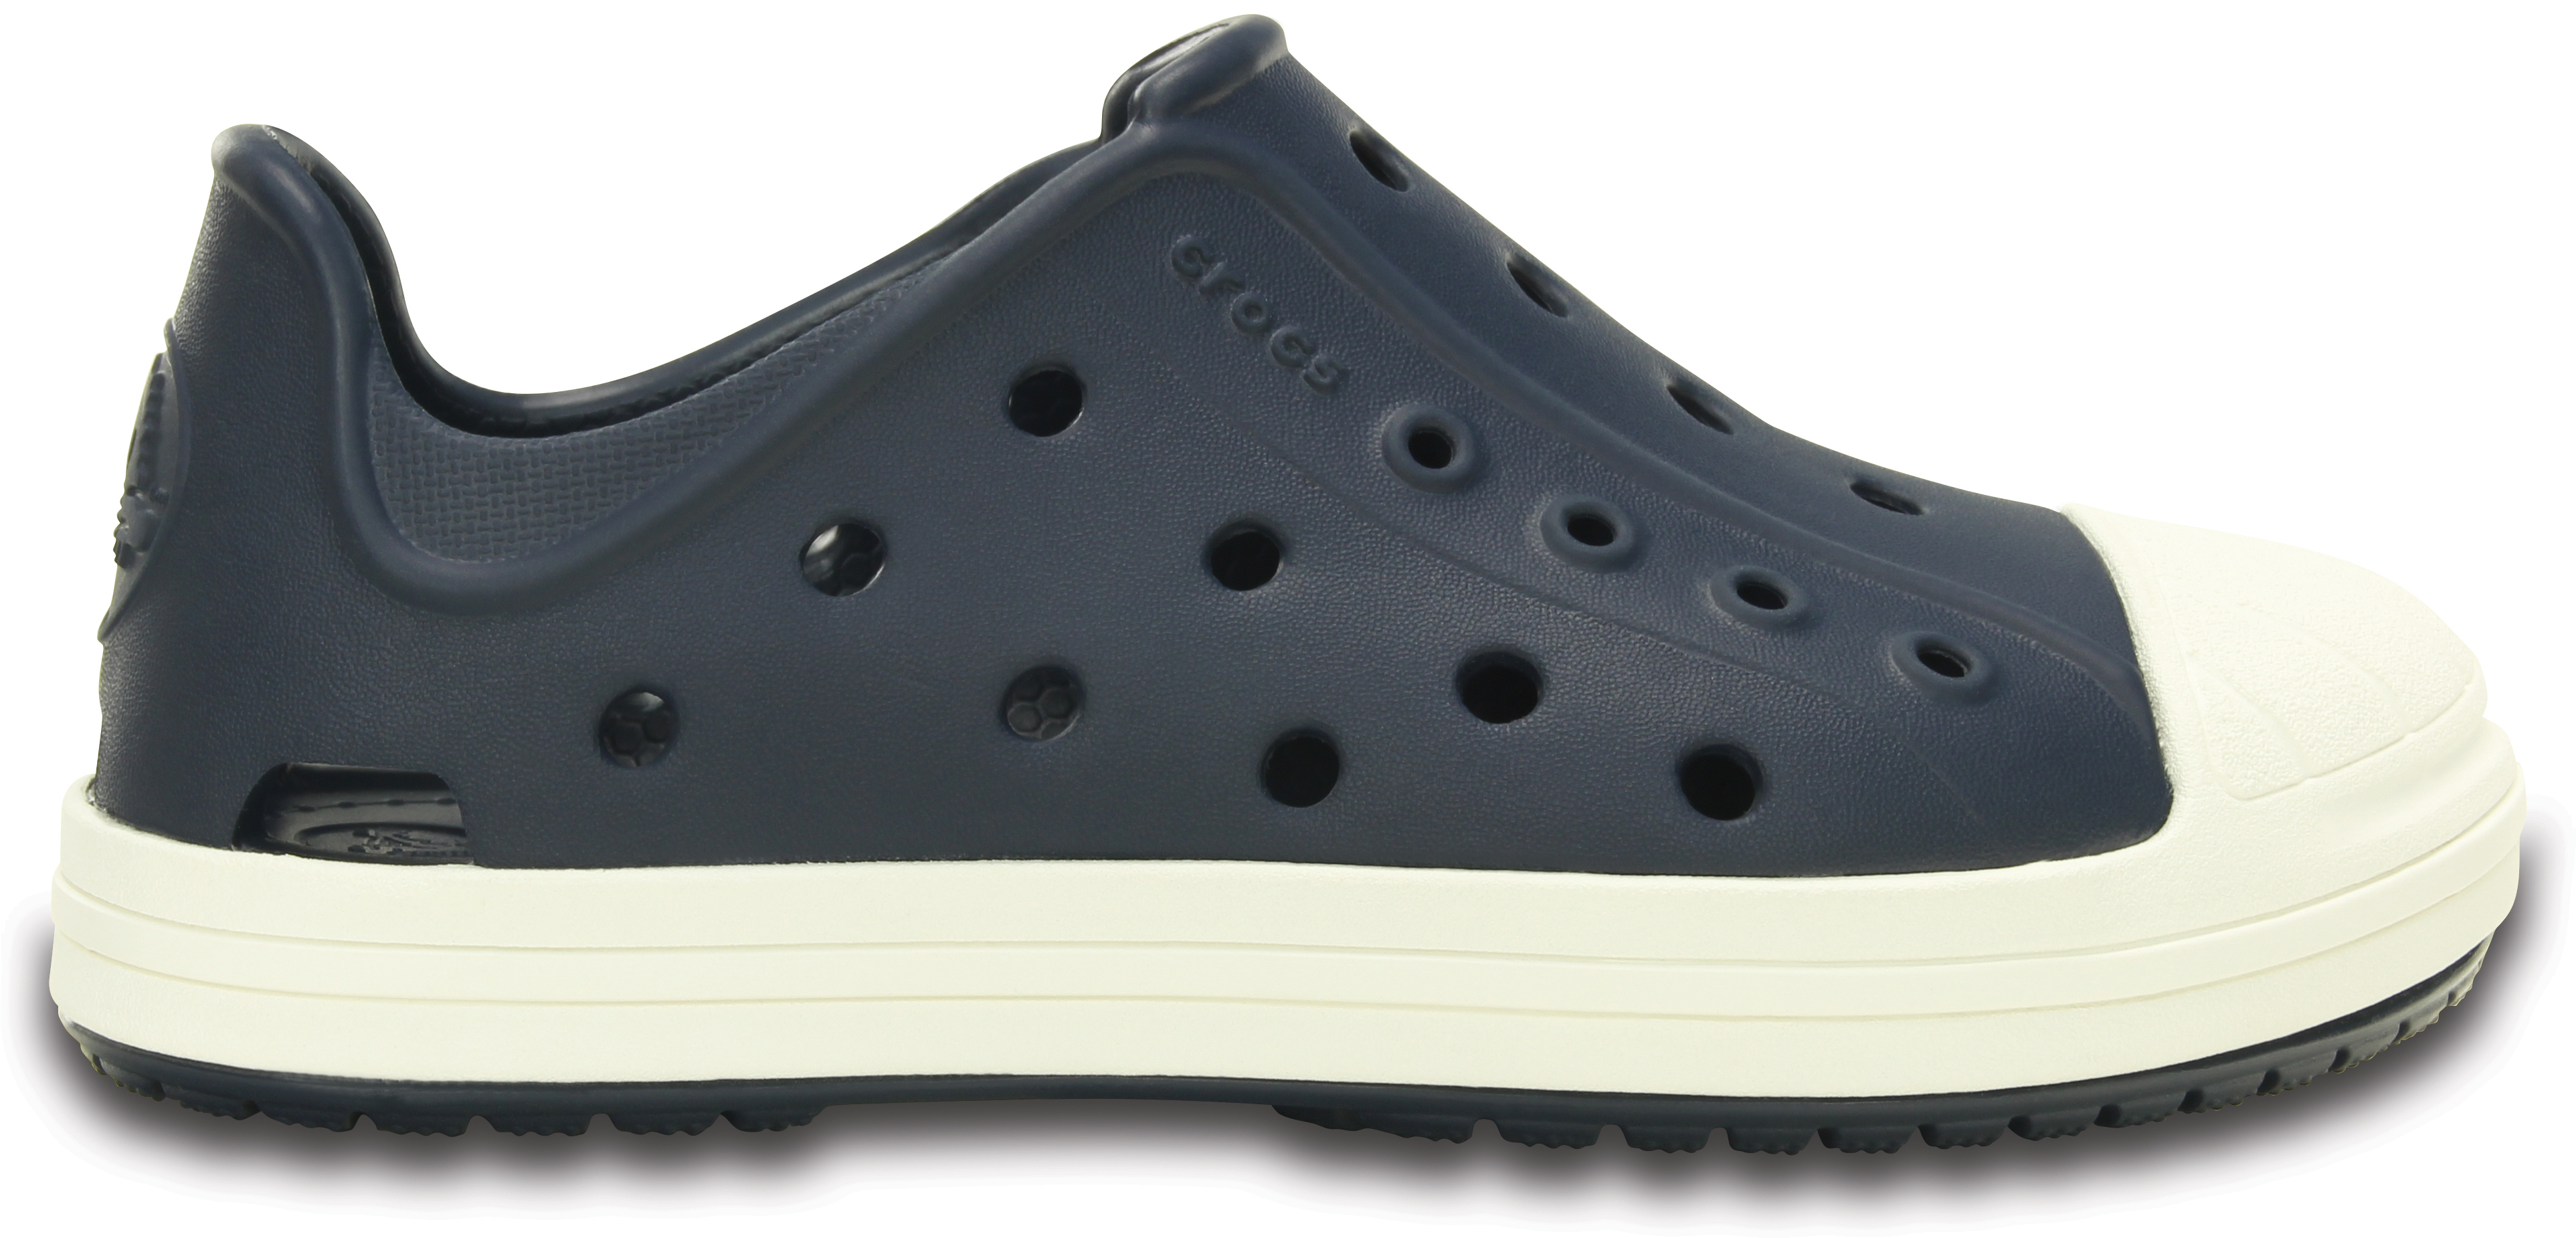 Crocs Crocs Bump It Shoe Kids - Navy/Oyster C7